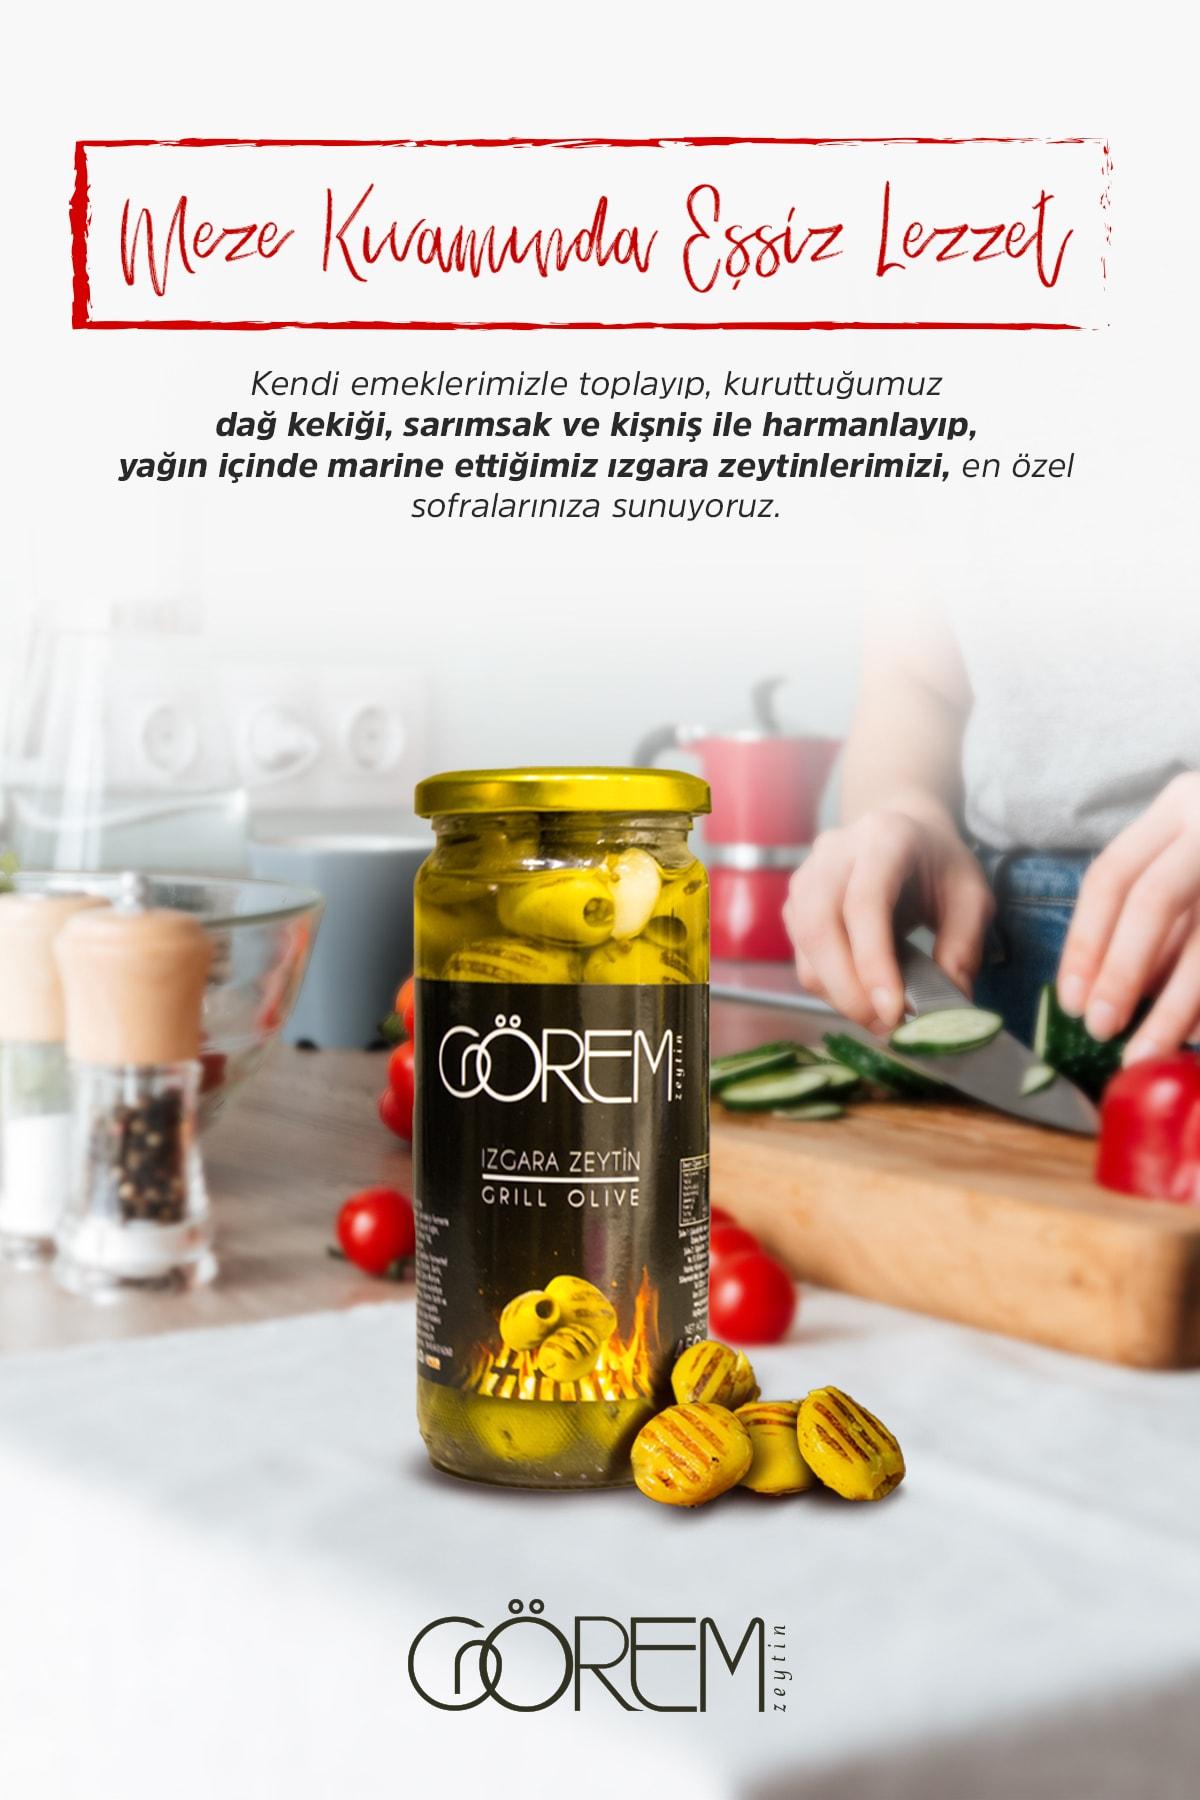 Görem Zeytin Izgara (Grill ) Zeytin 450gr. 1